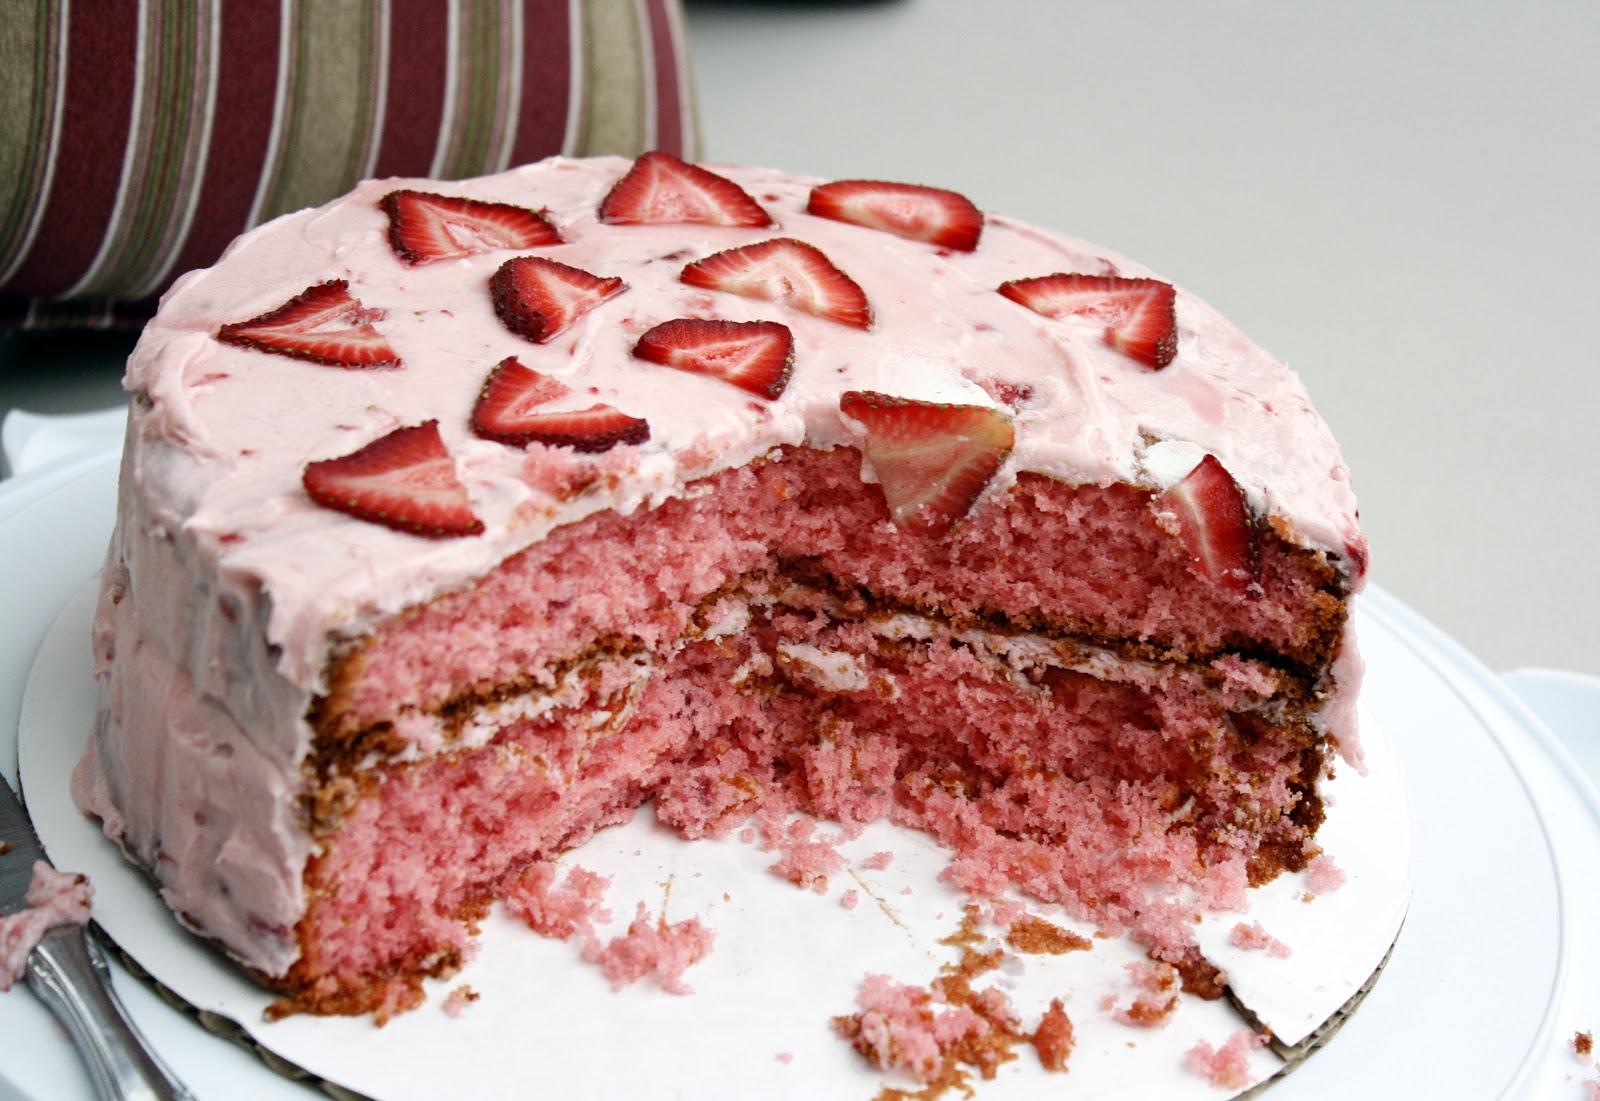 Strawberry Jello Cake Recipe From Scratch